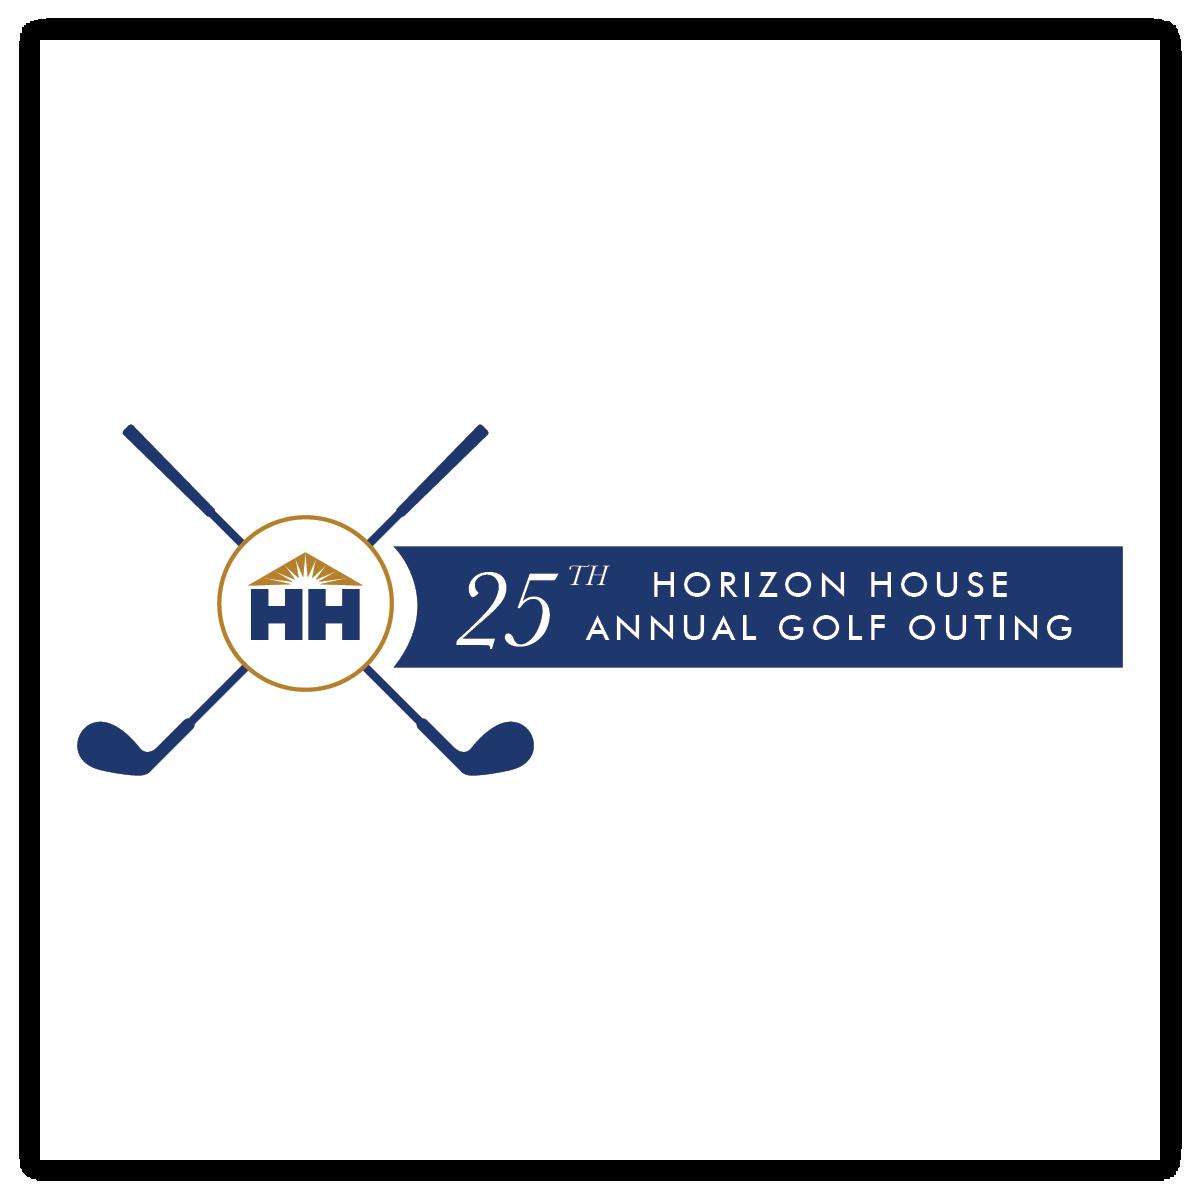 Logo Images7.png